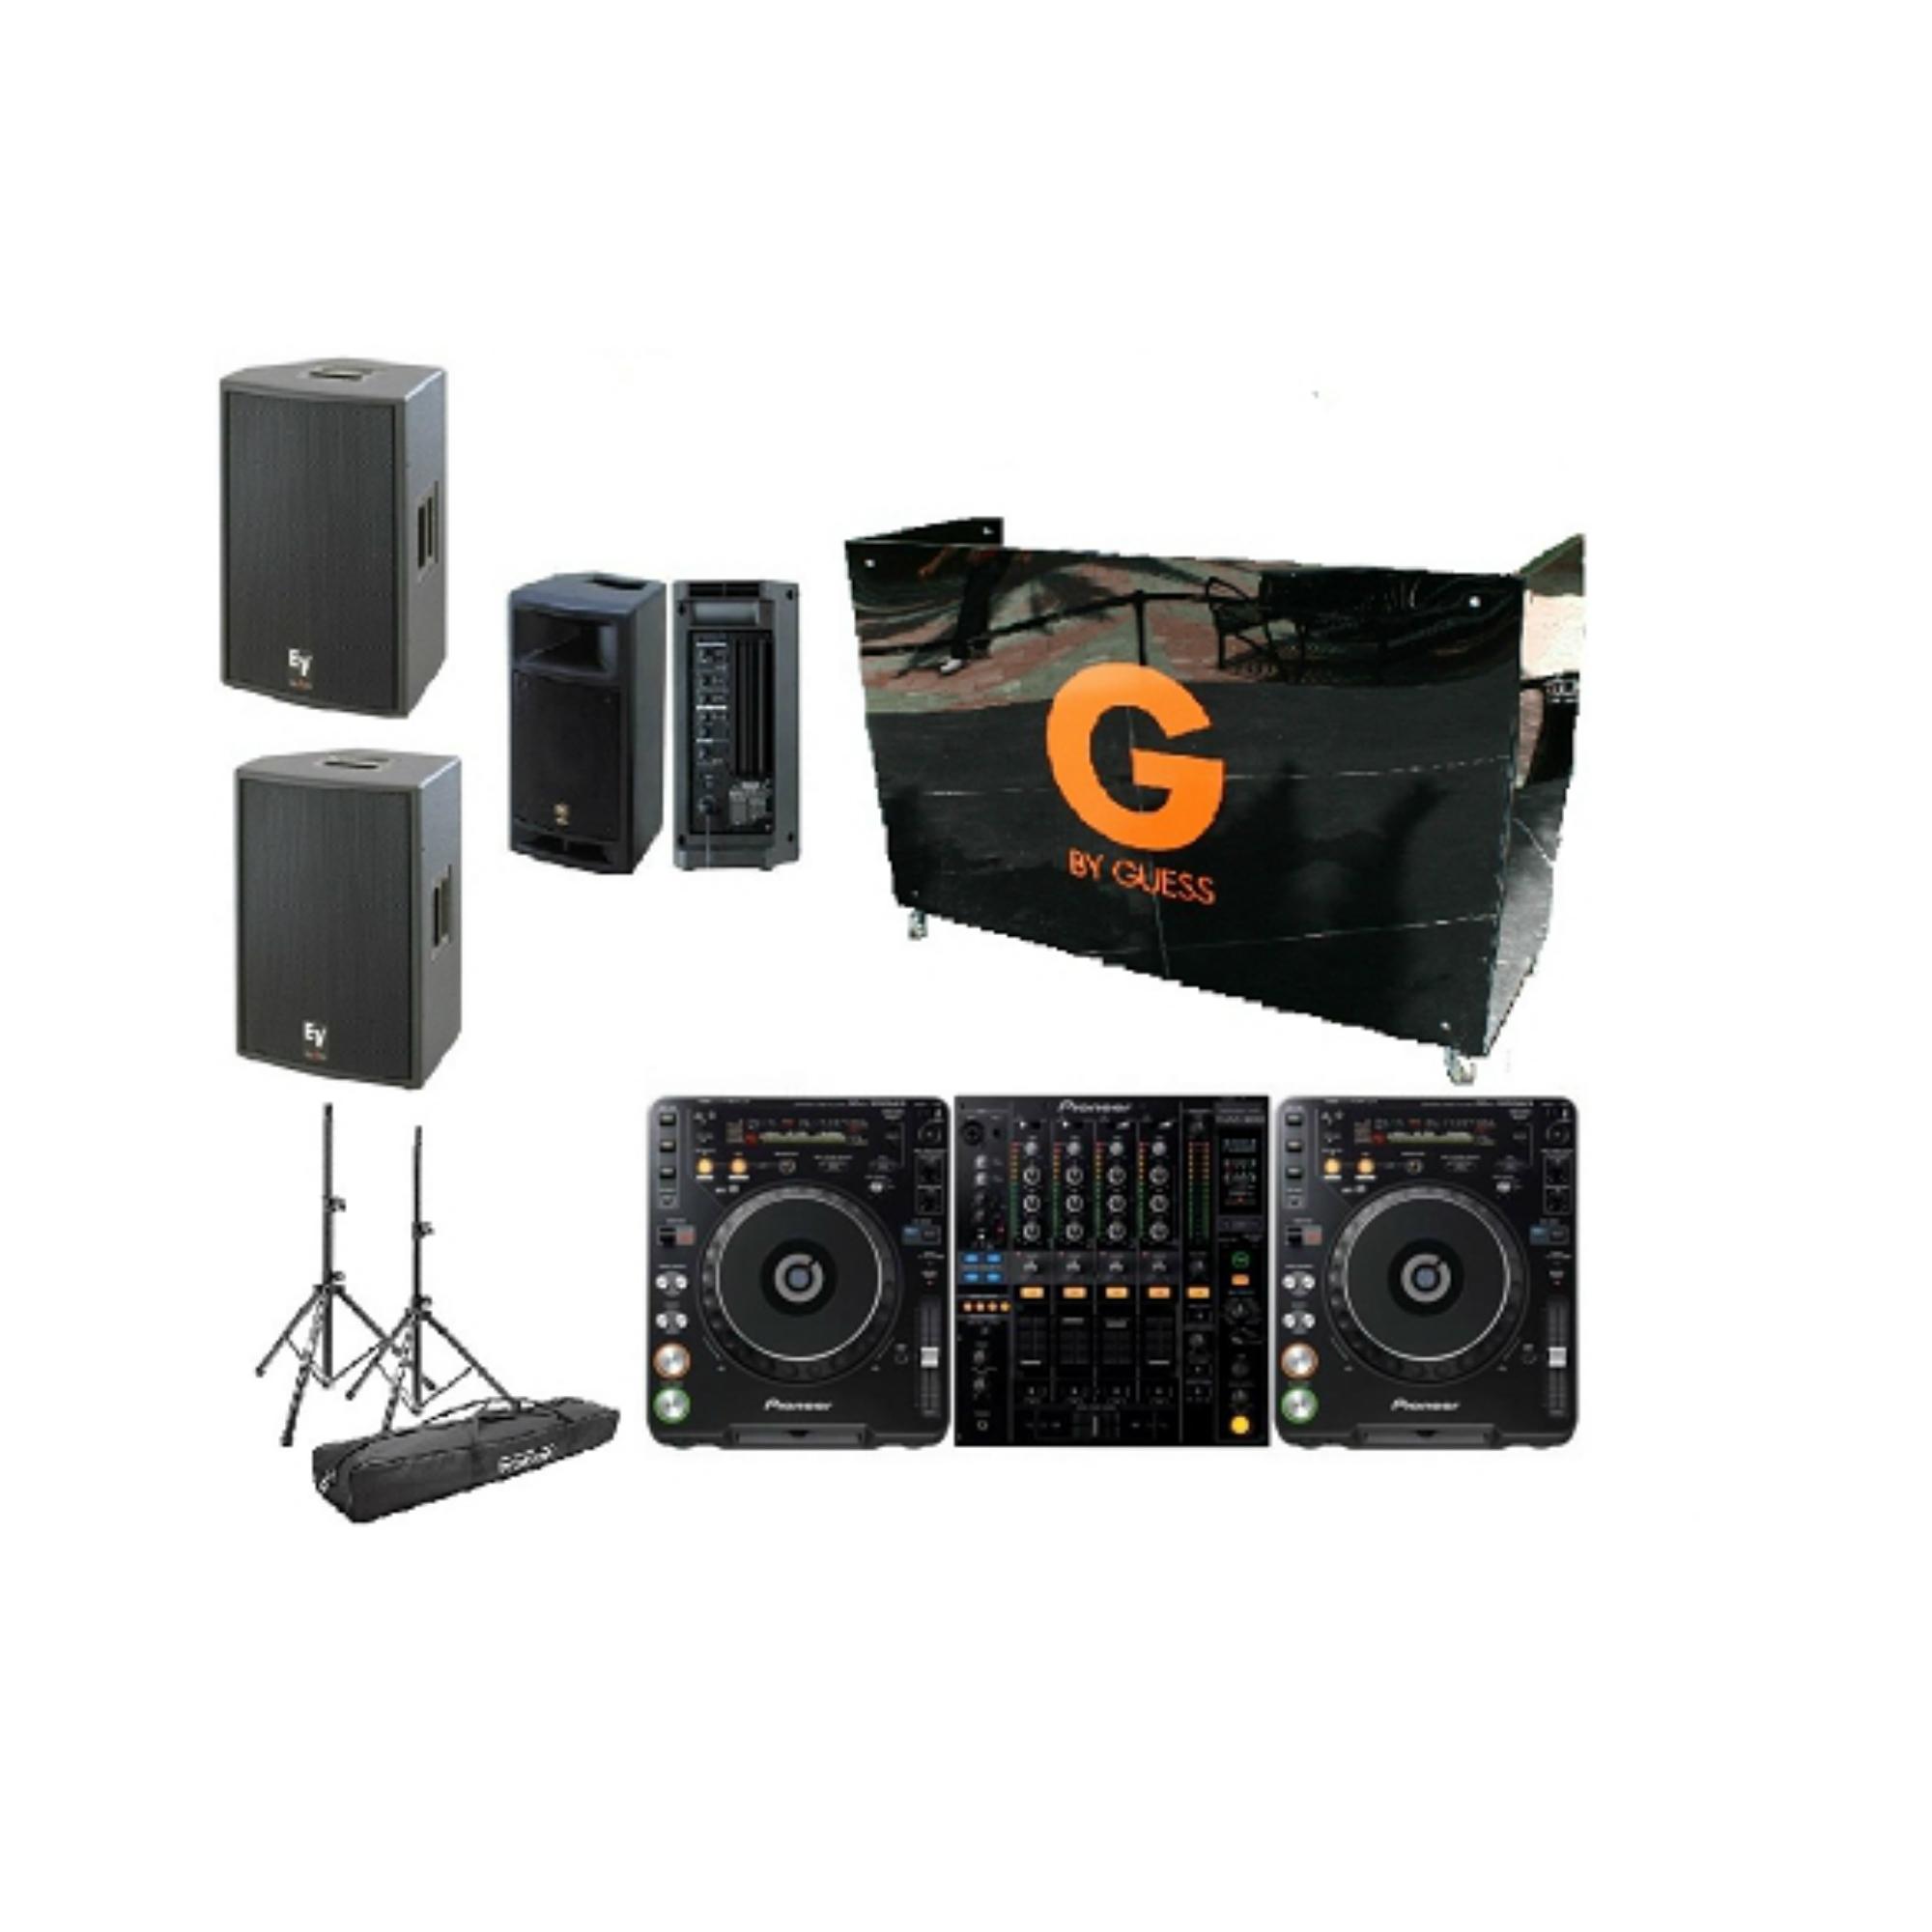 Speaker Rental Prices : two cdj 1000s and a djm 800 dj booth dj monitor and powered speakers rental package dj peoples ~ Russianpoet.info Haus und Dekorationen